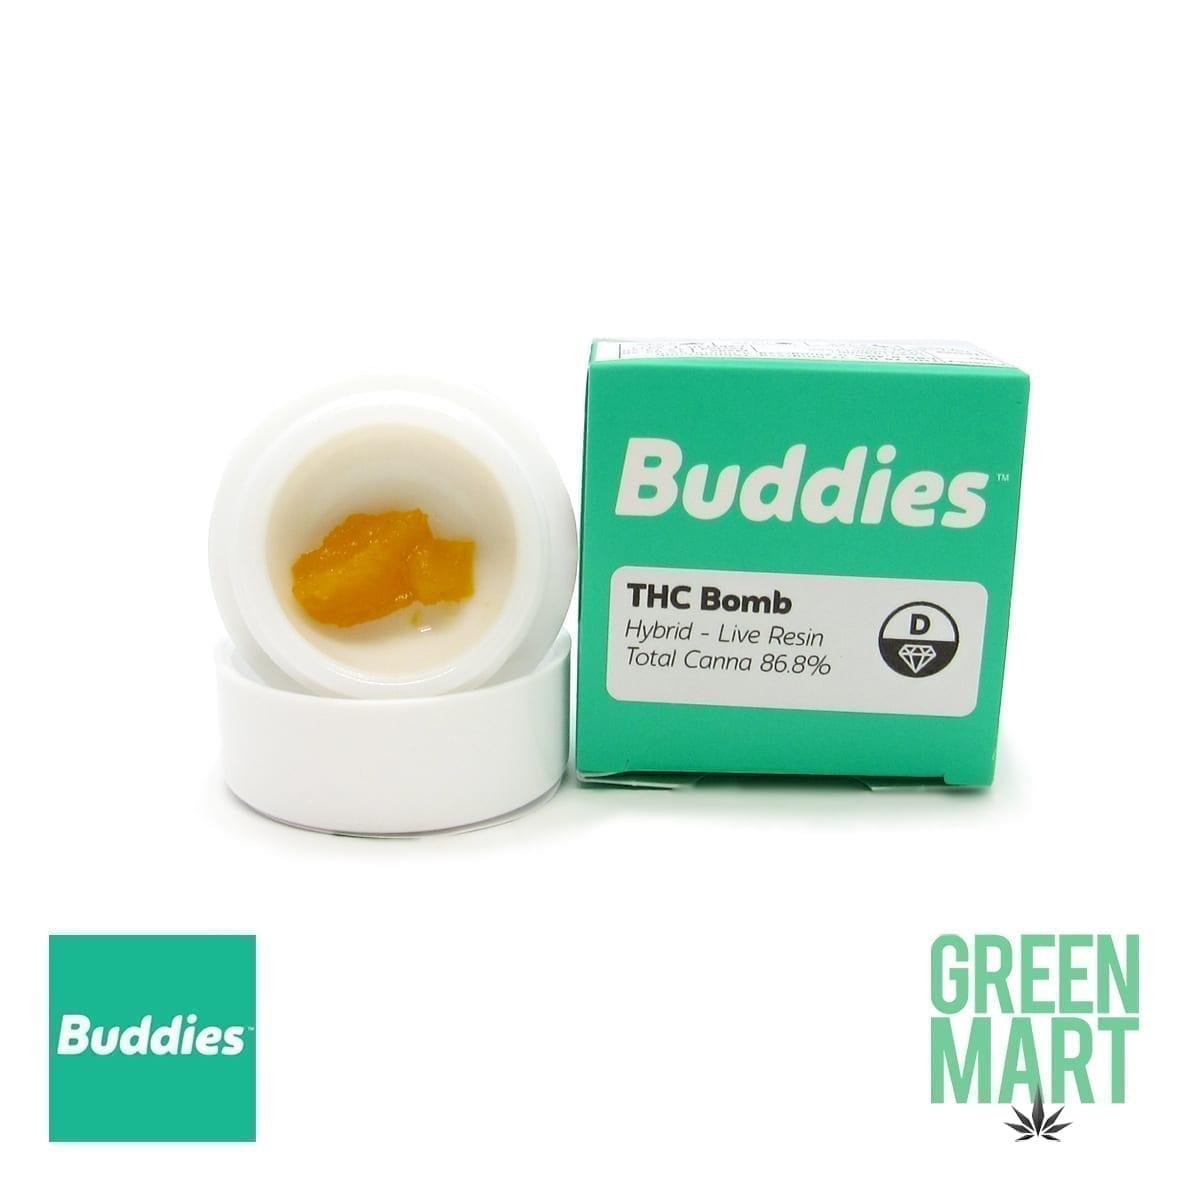 Buddies Dab - THC Bomb